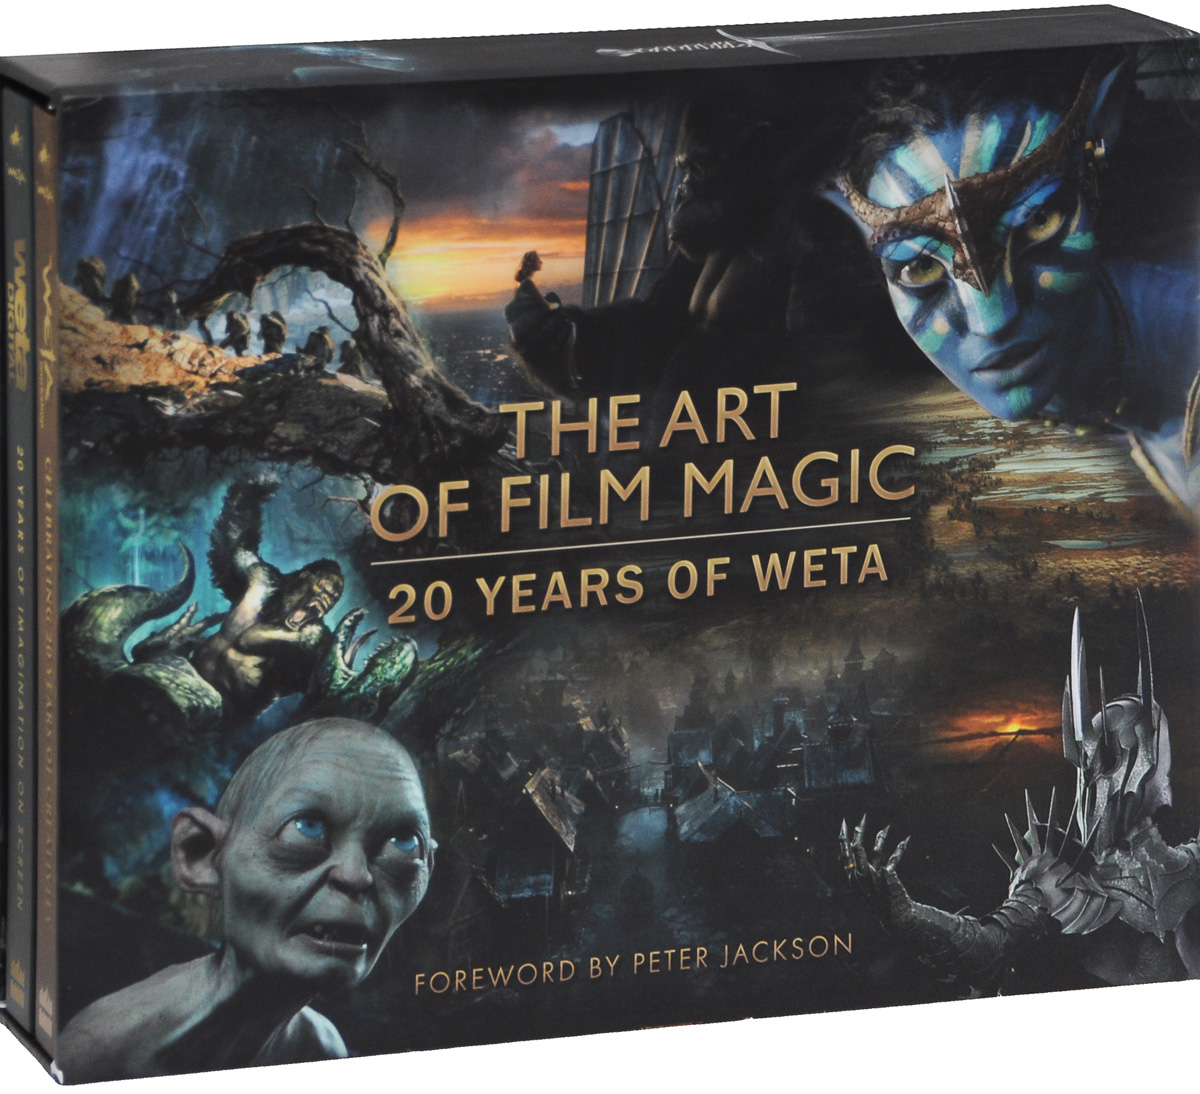 The Art of Film Magic: 20 Years of Weta 65 years of snoopy